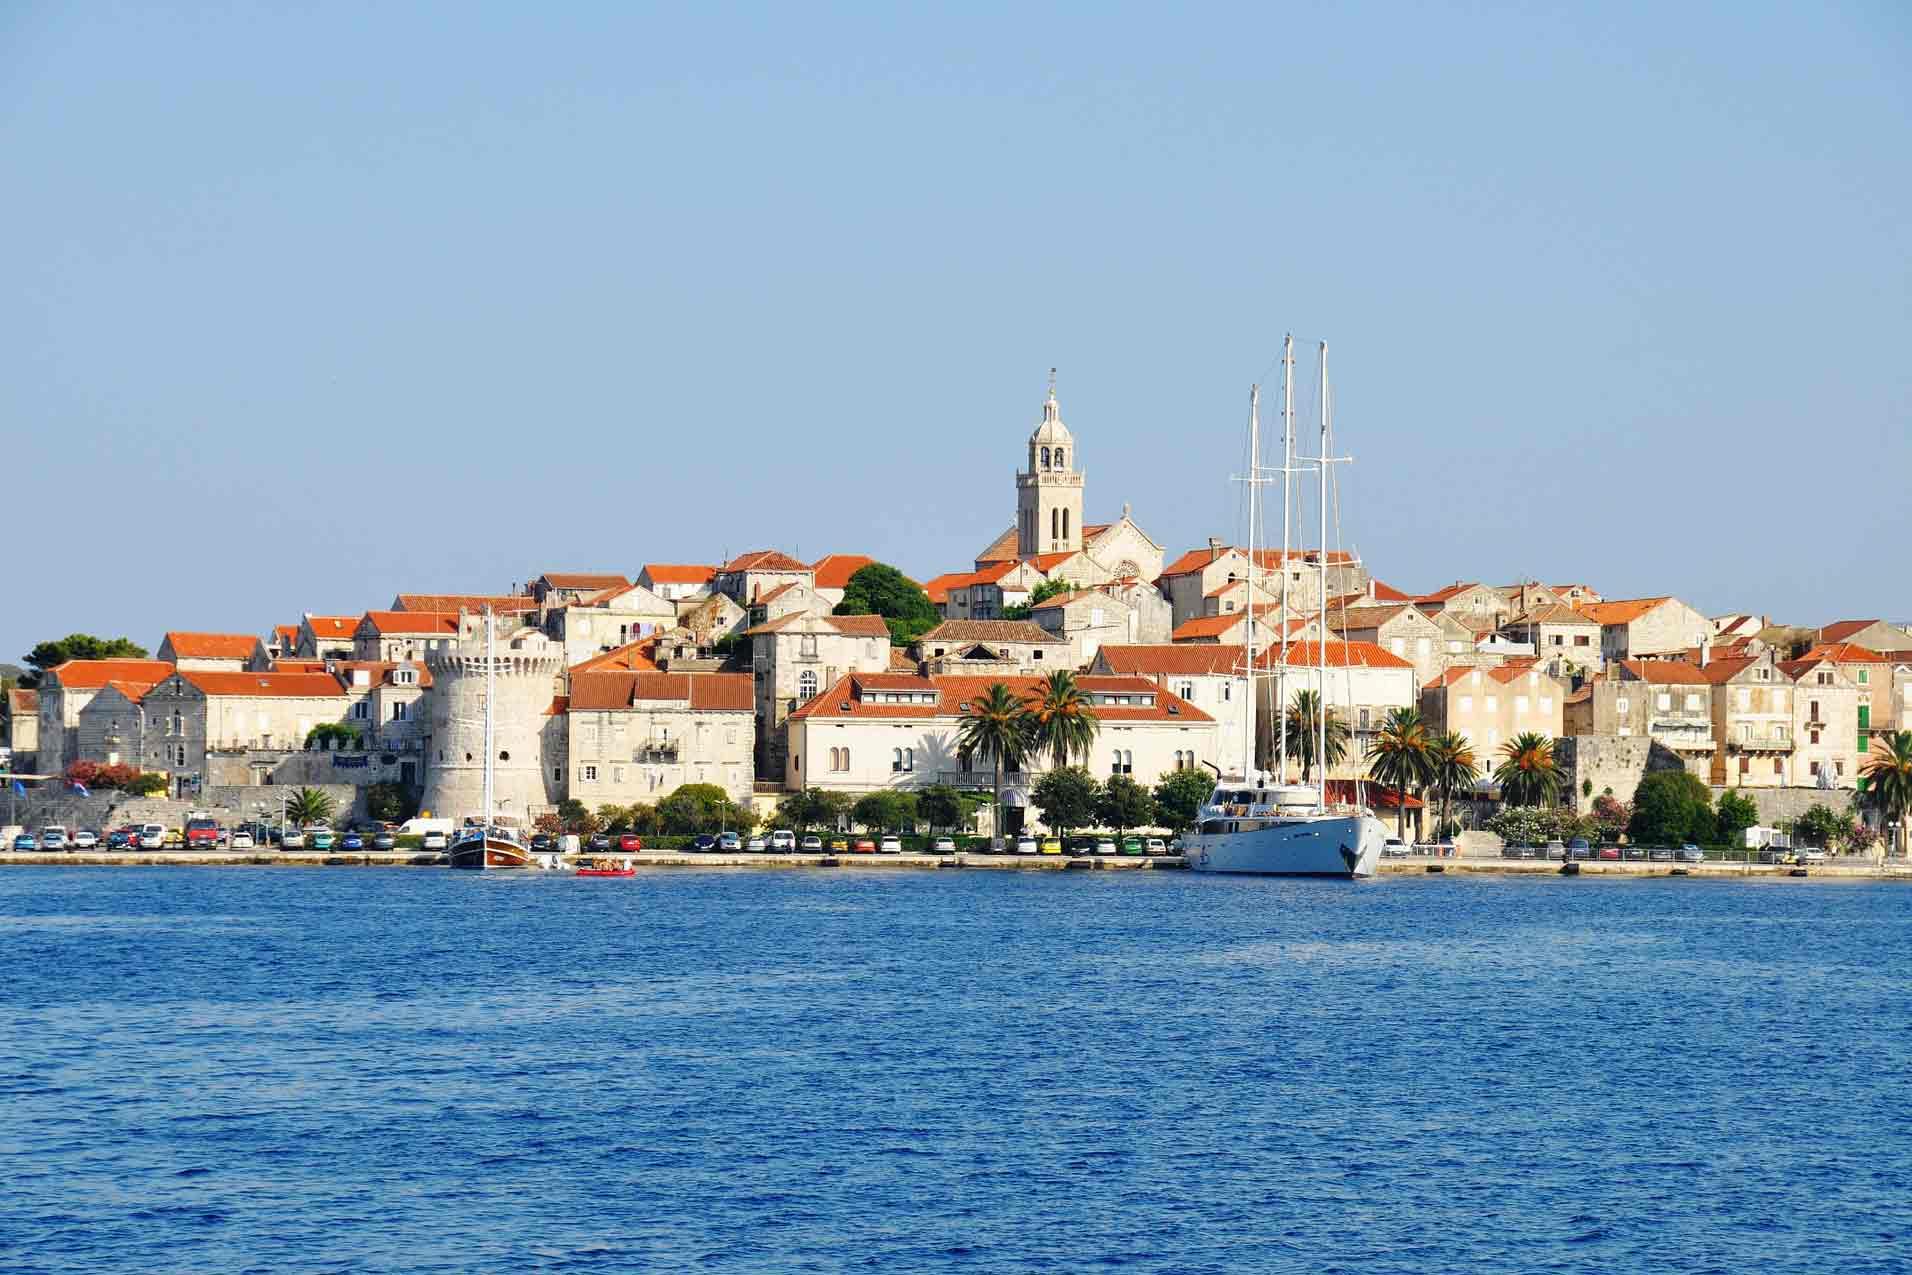 Harbour of Korcula, Croatia, Cultural Differences